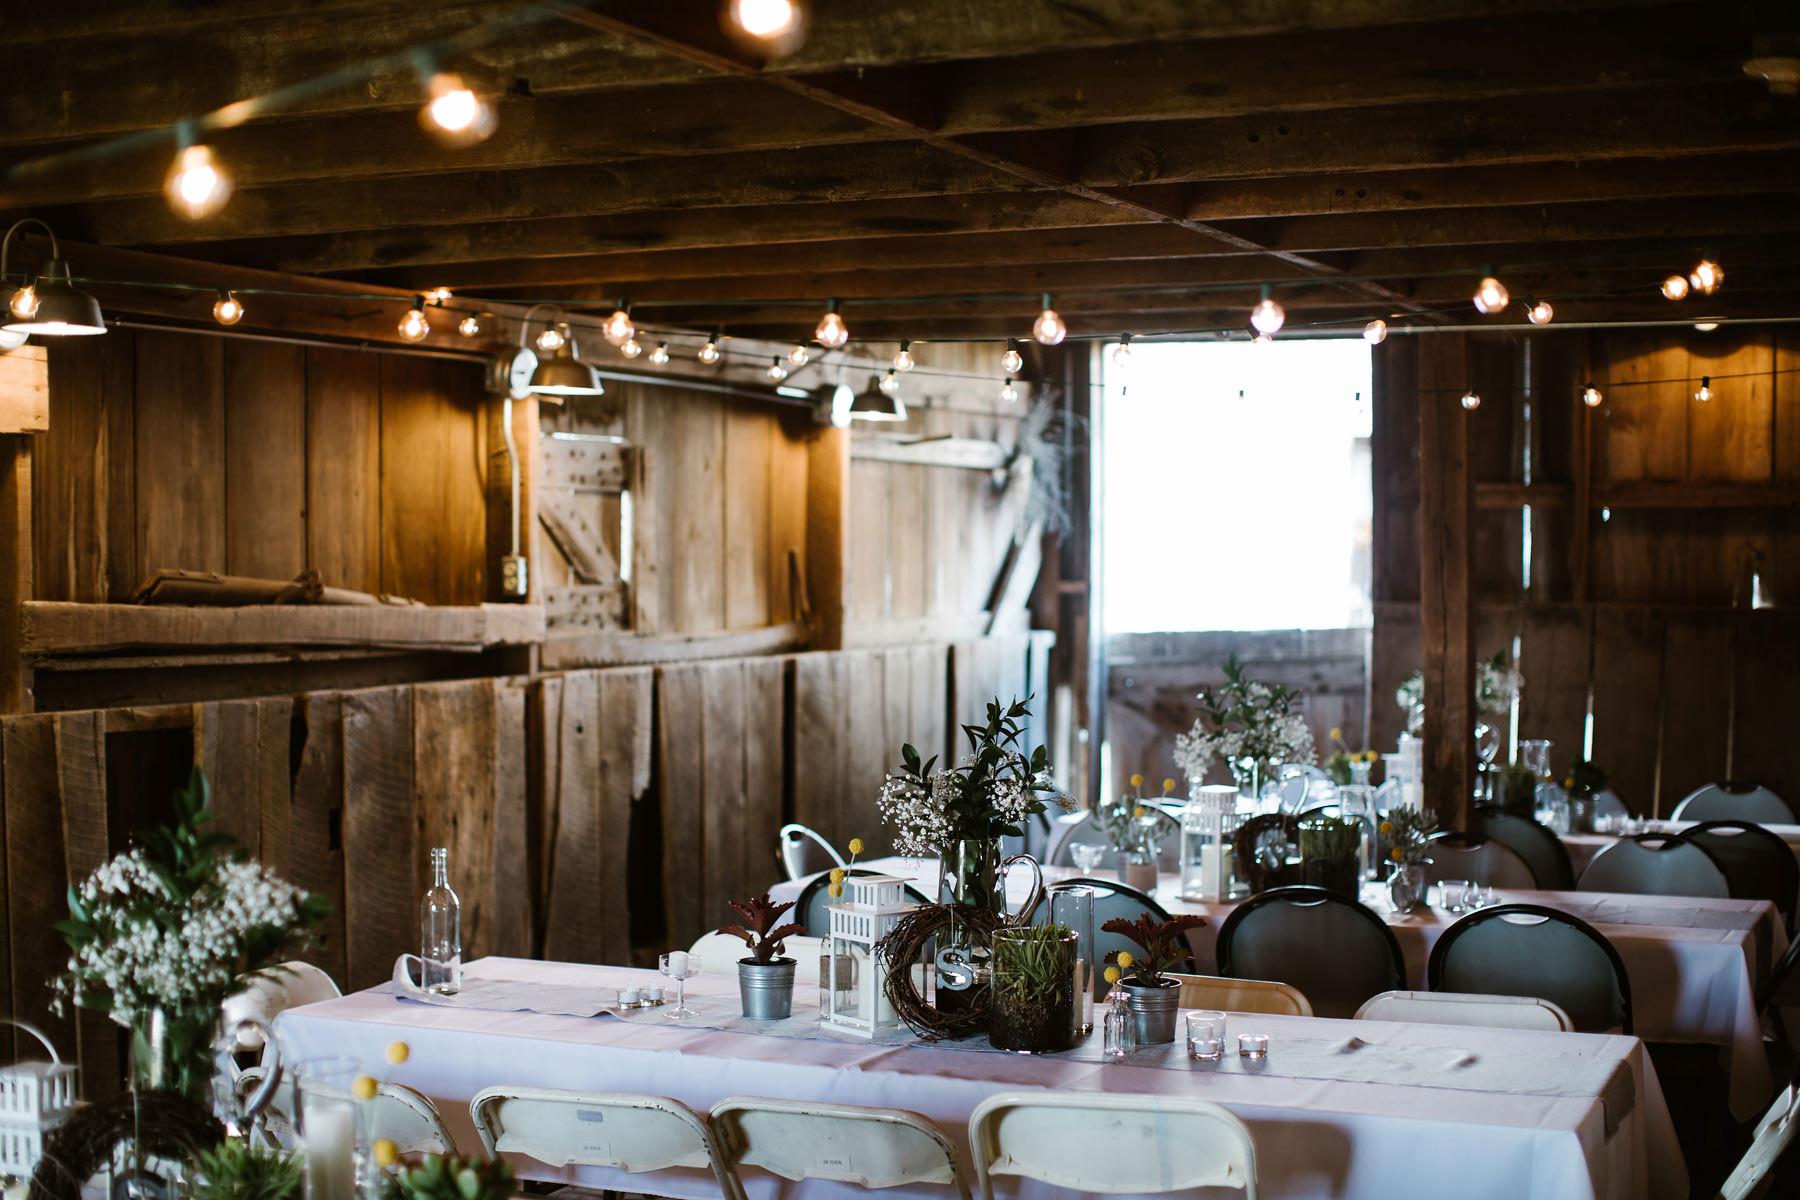 Alldredge Orchard Kansas City_Kindling Wedding Photography BLOG 11.JPG